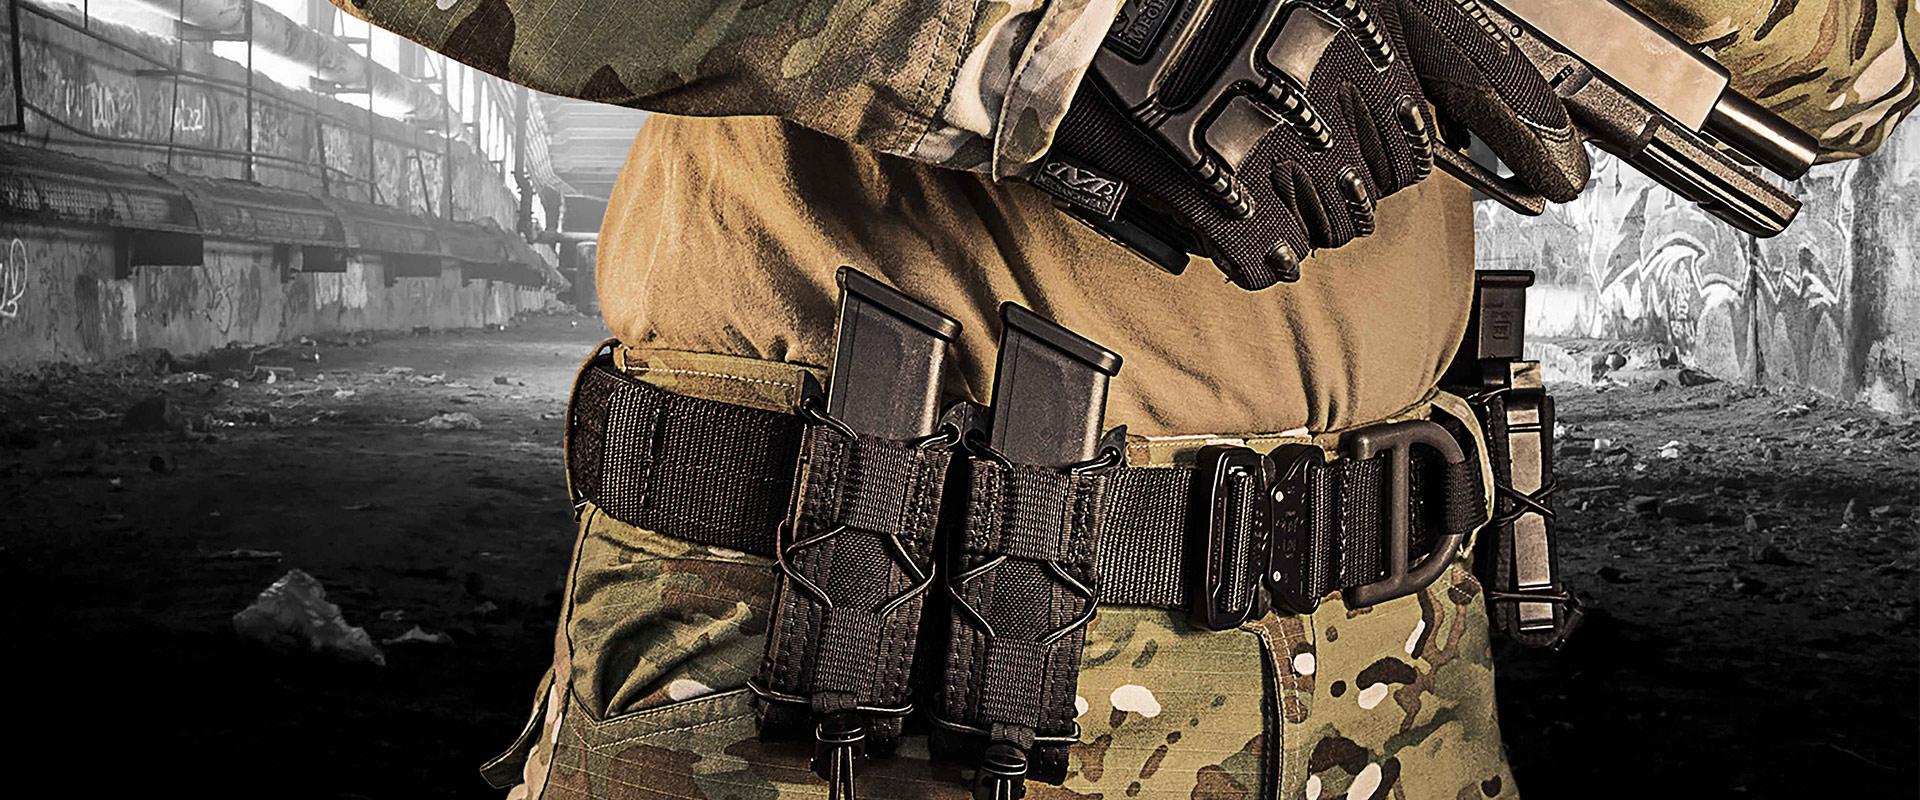 AustriAlpin COBRA Military Buckles